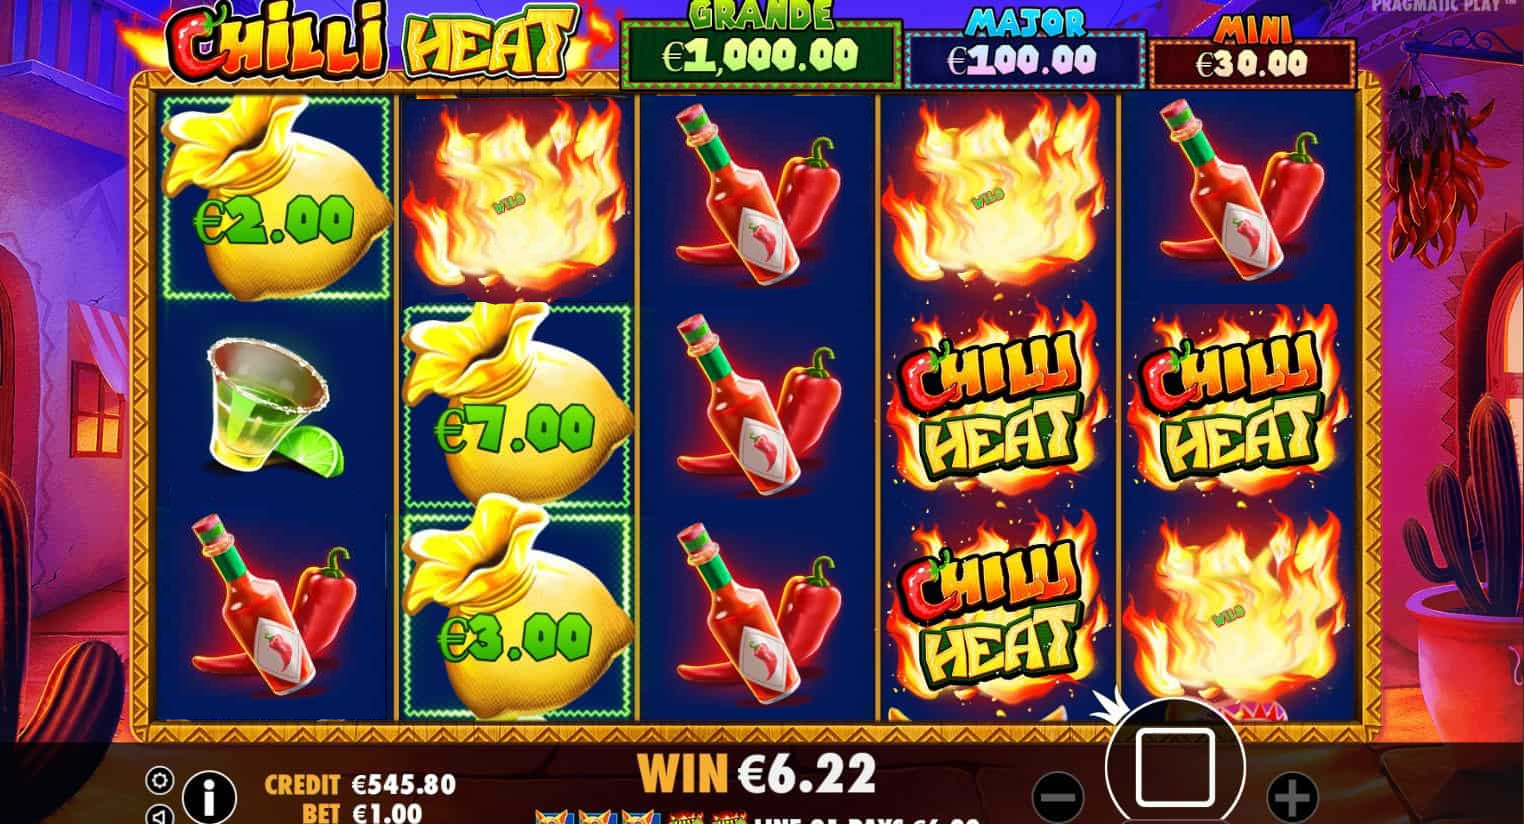 Chilli Heat Online Slots Gameplay